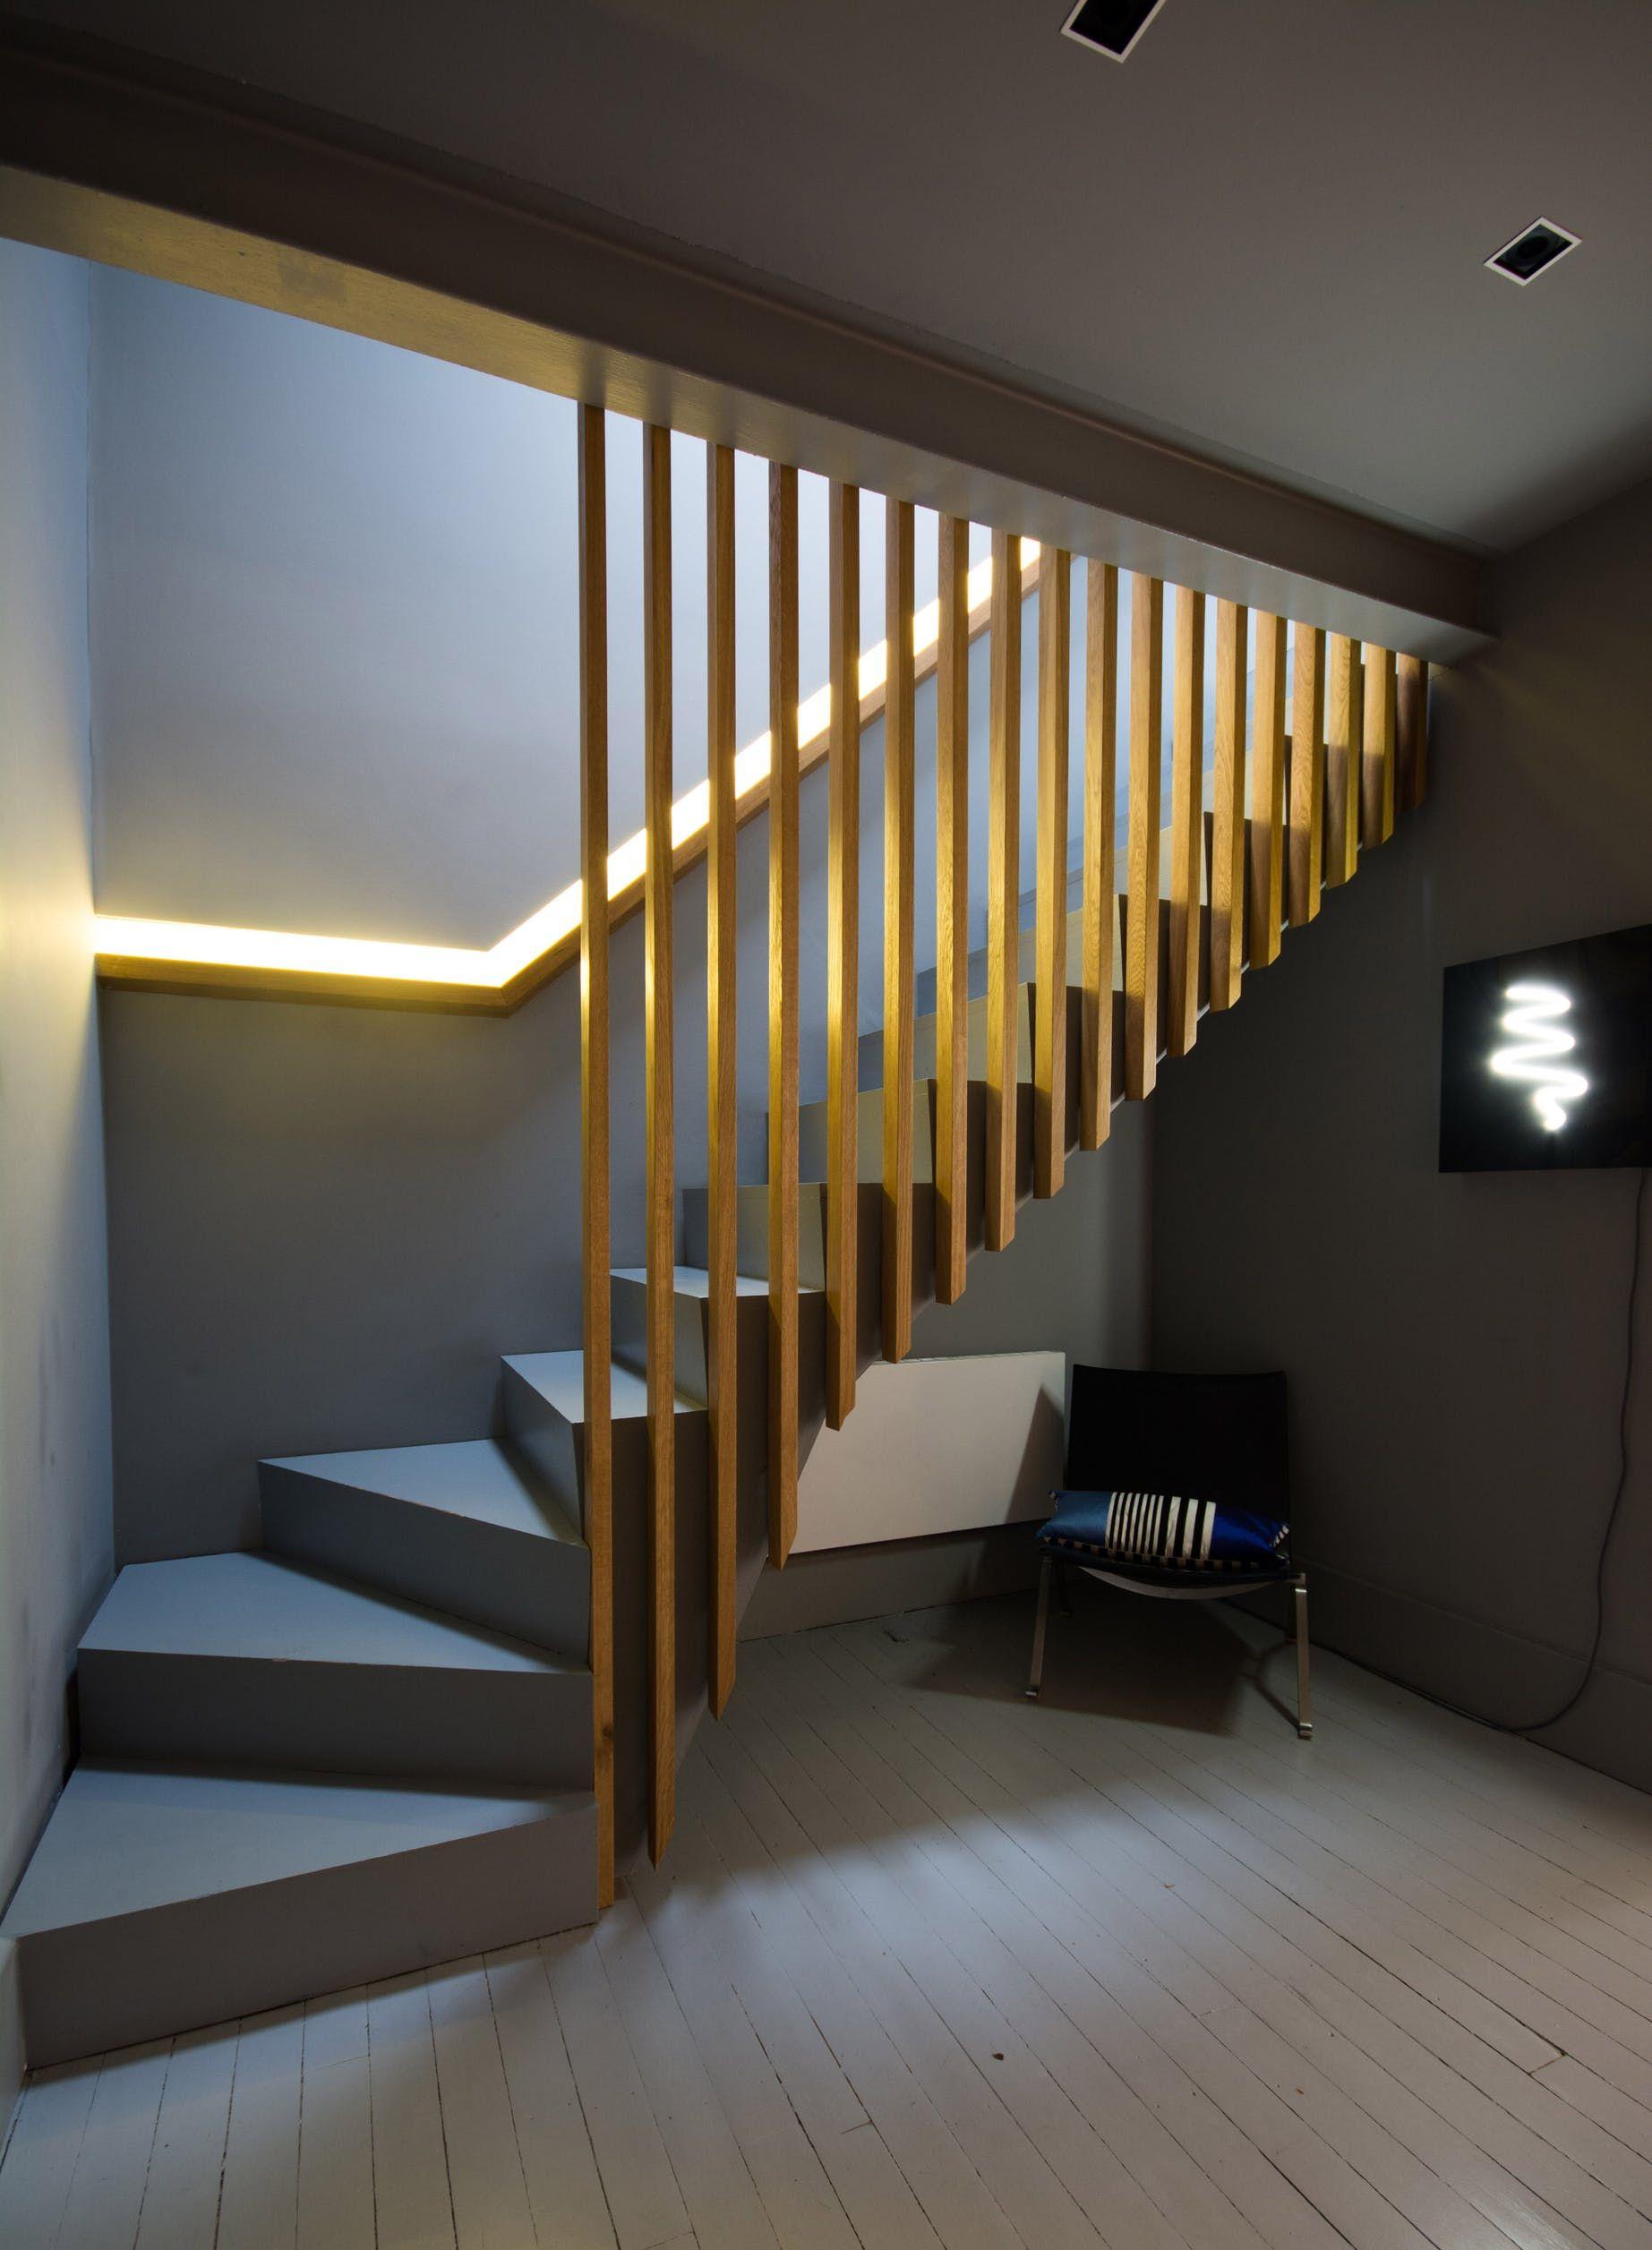 Basement Stair Lighting Ideas: Five Shades Of Grey